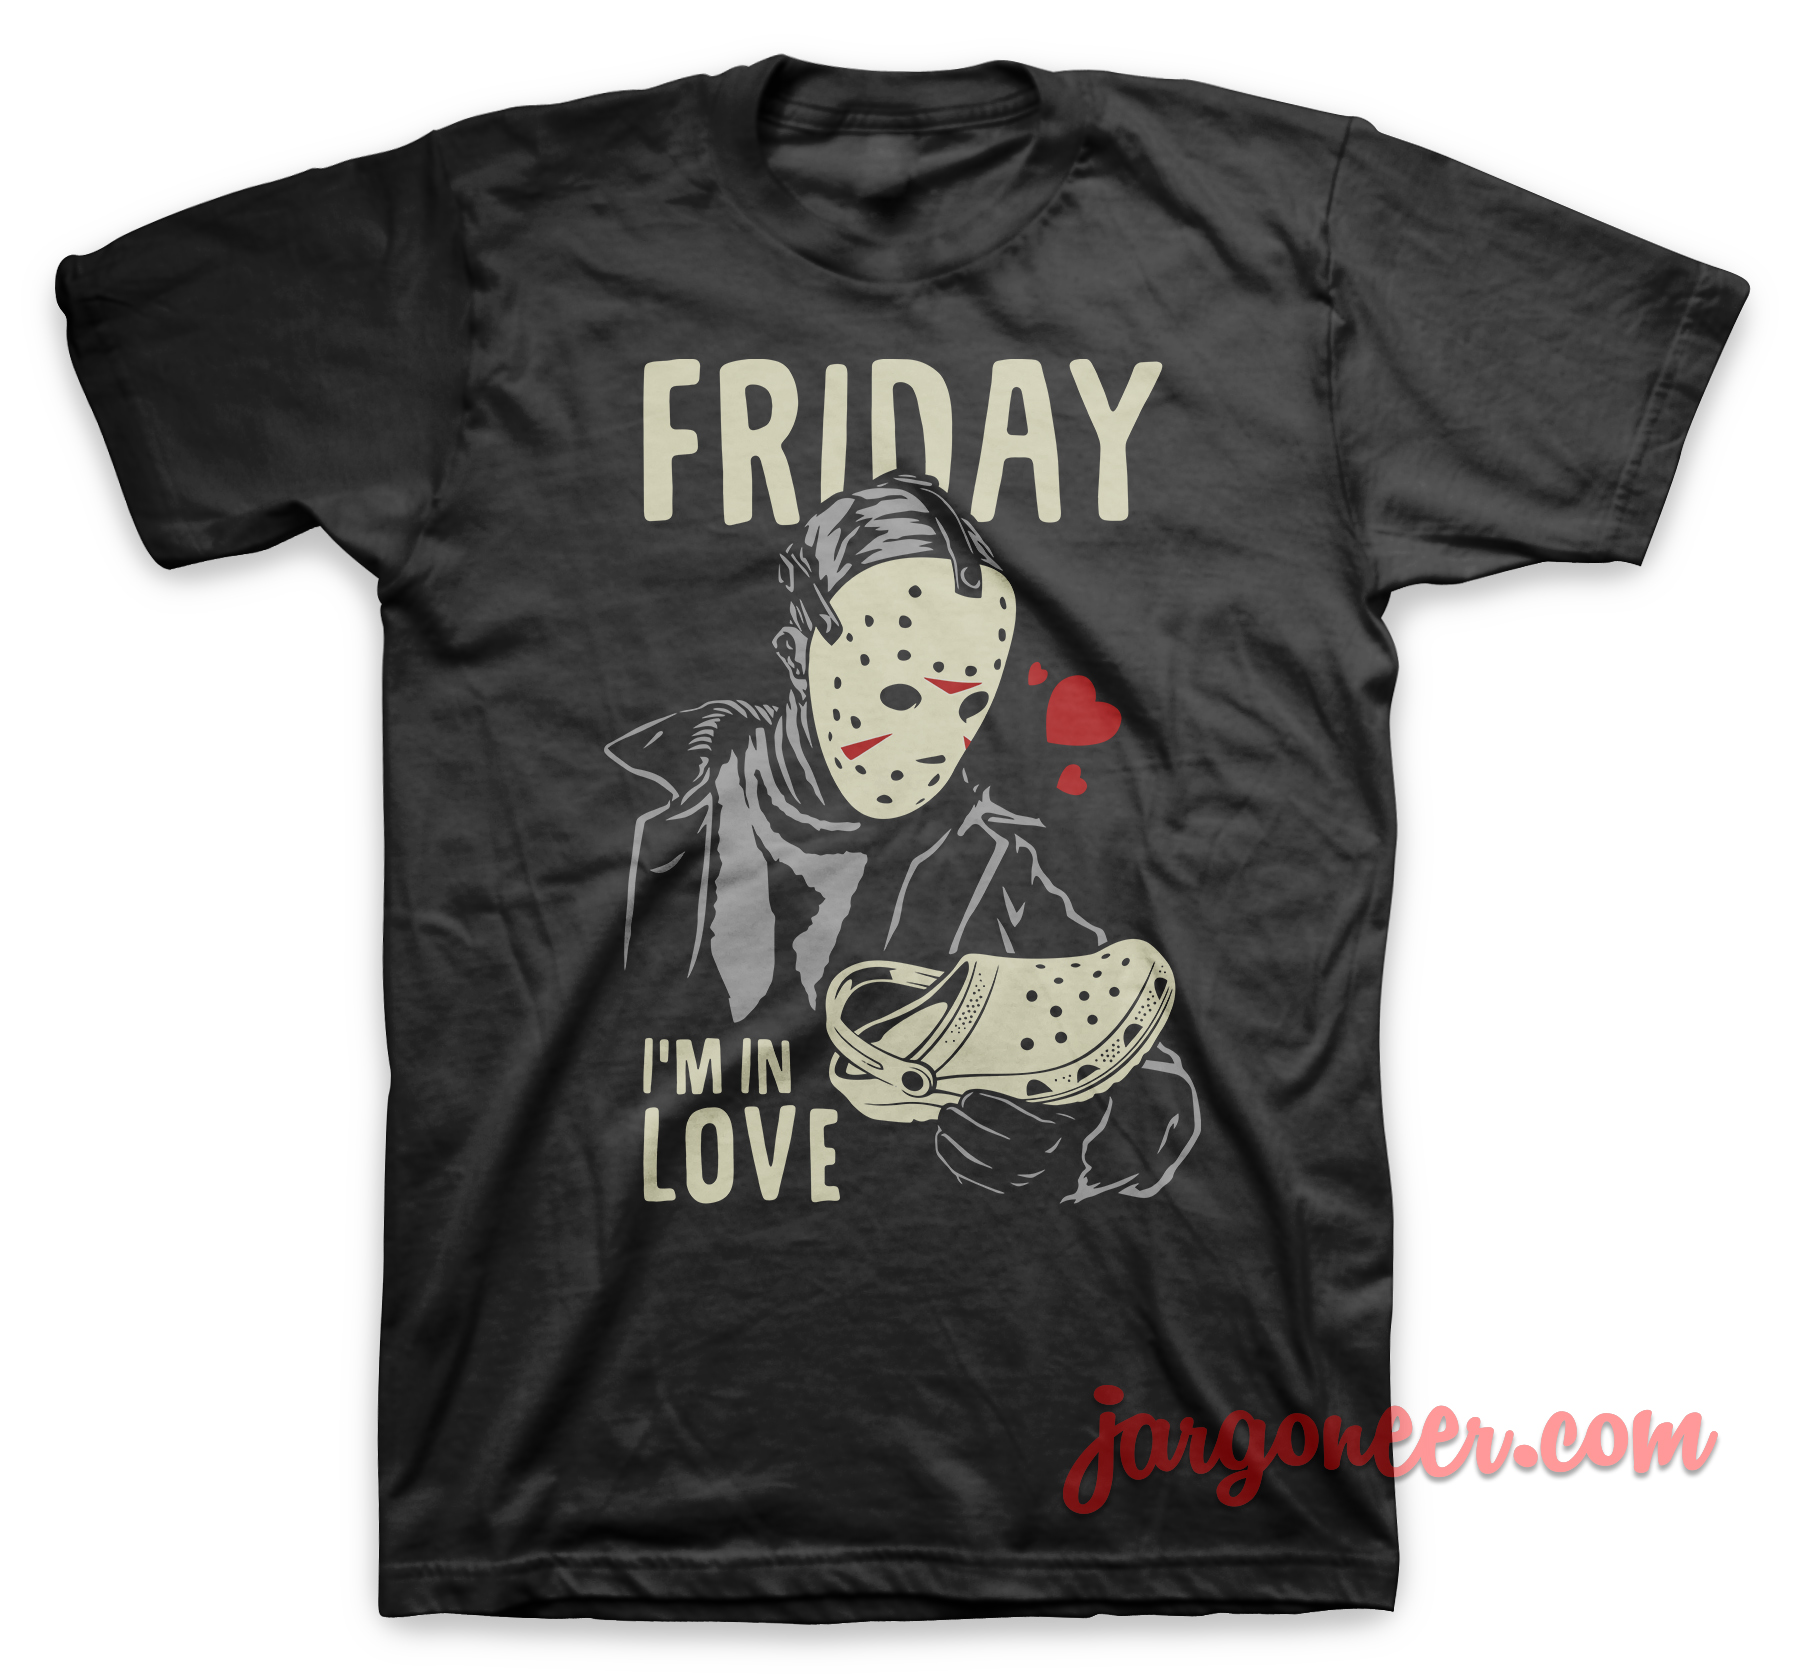 horror in love t shirt cool shirt designs